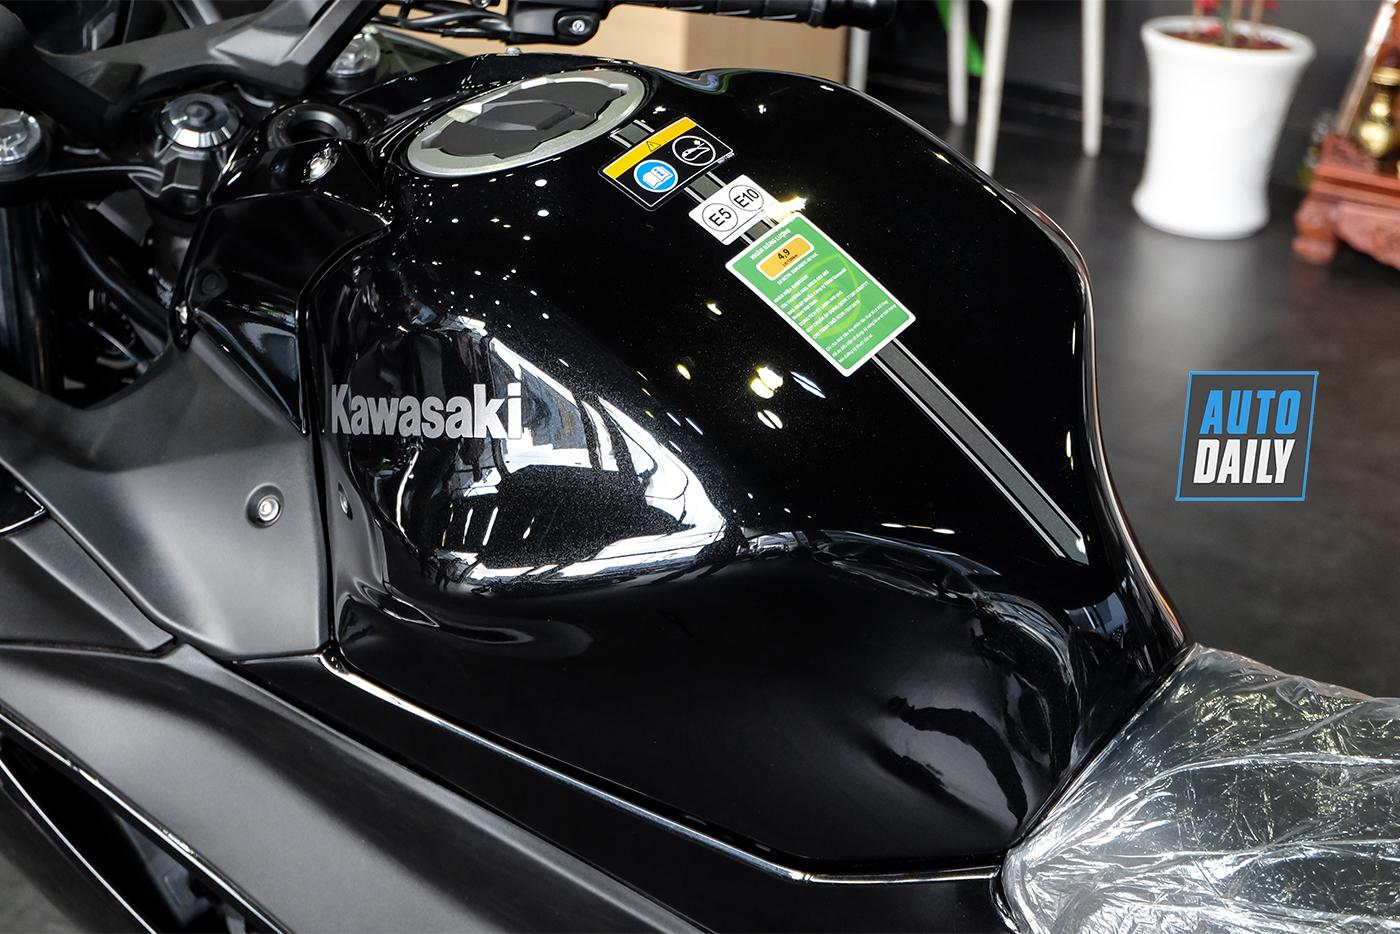 kawasaki-ninja-650-2020-17.jpg